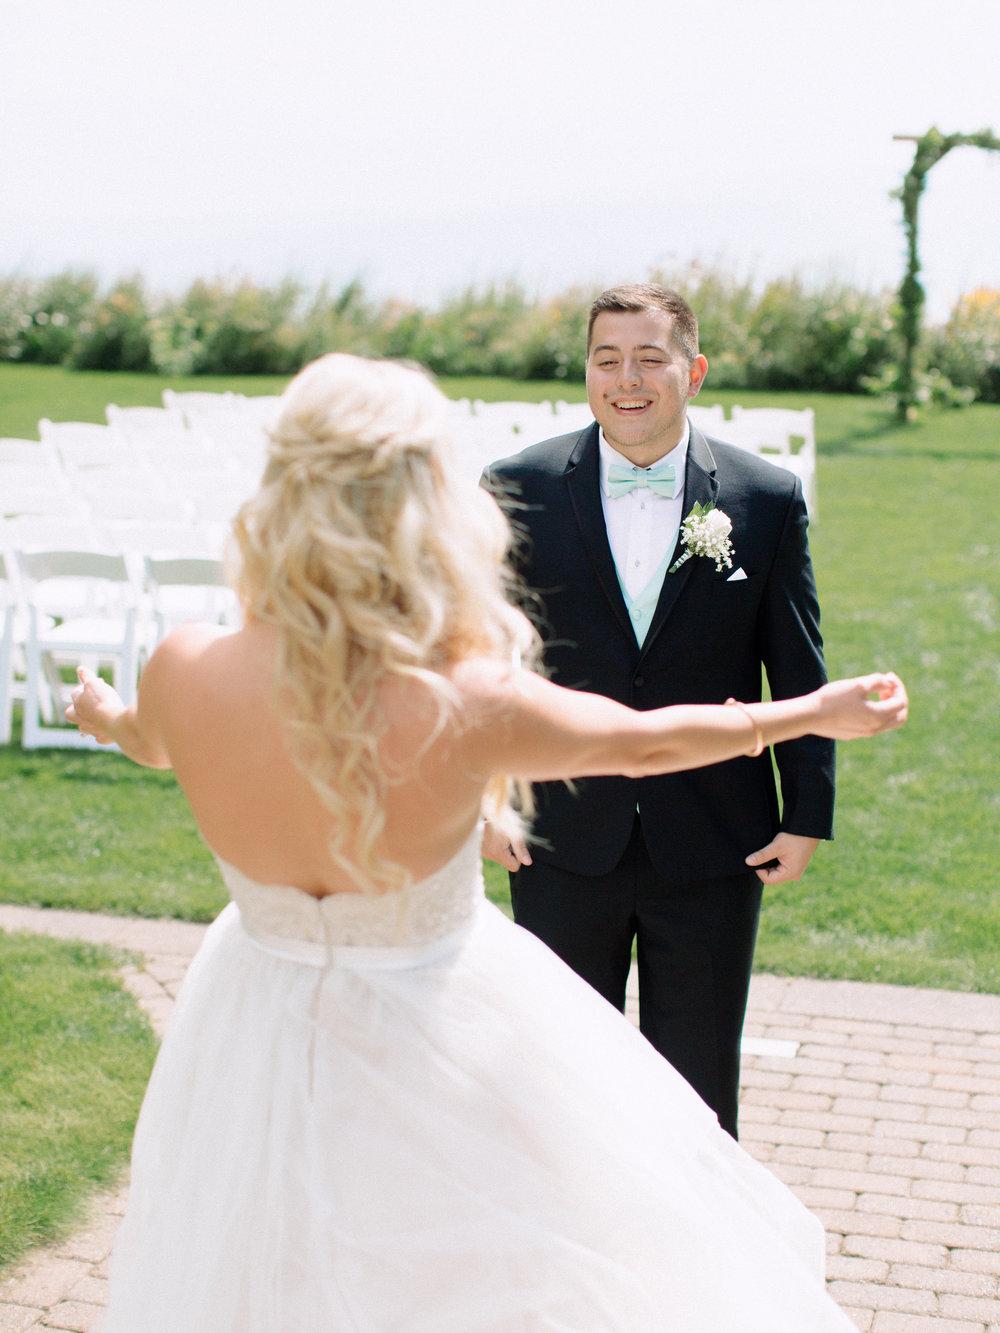 Kristina-Tyler-Wedding-First-Look-14.jpg